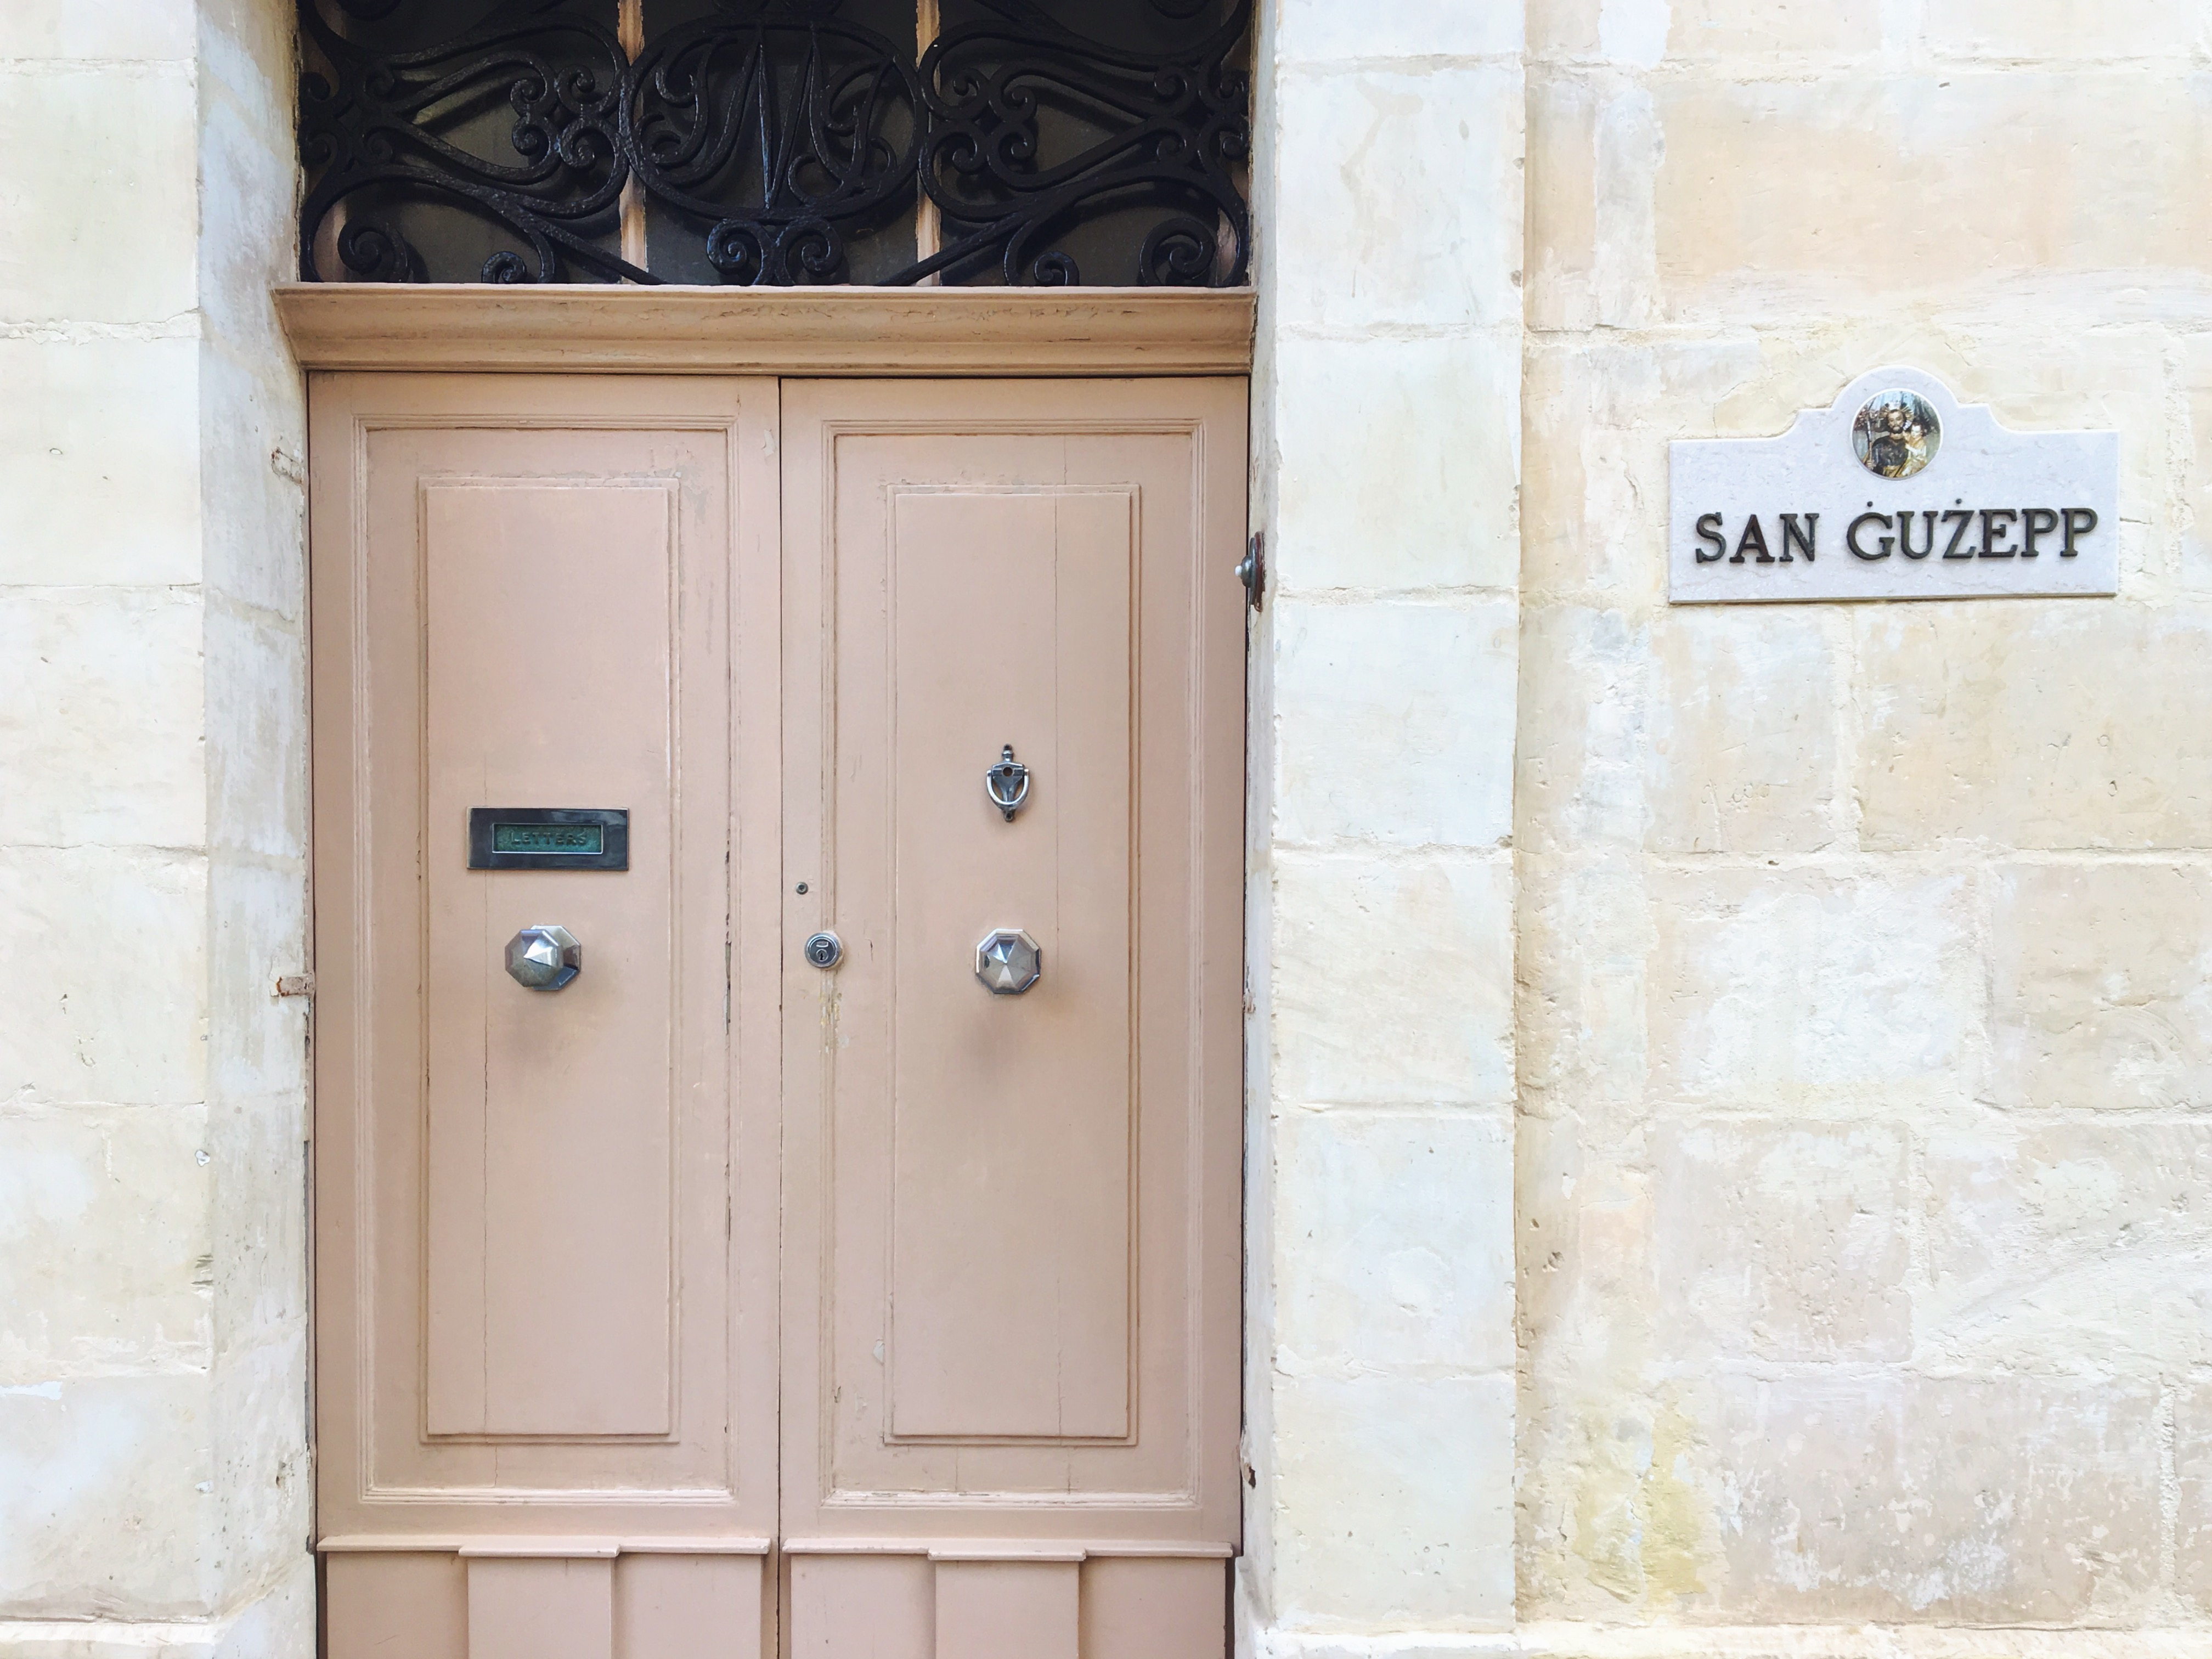 San Giuseppe in maltese